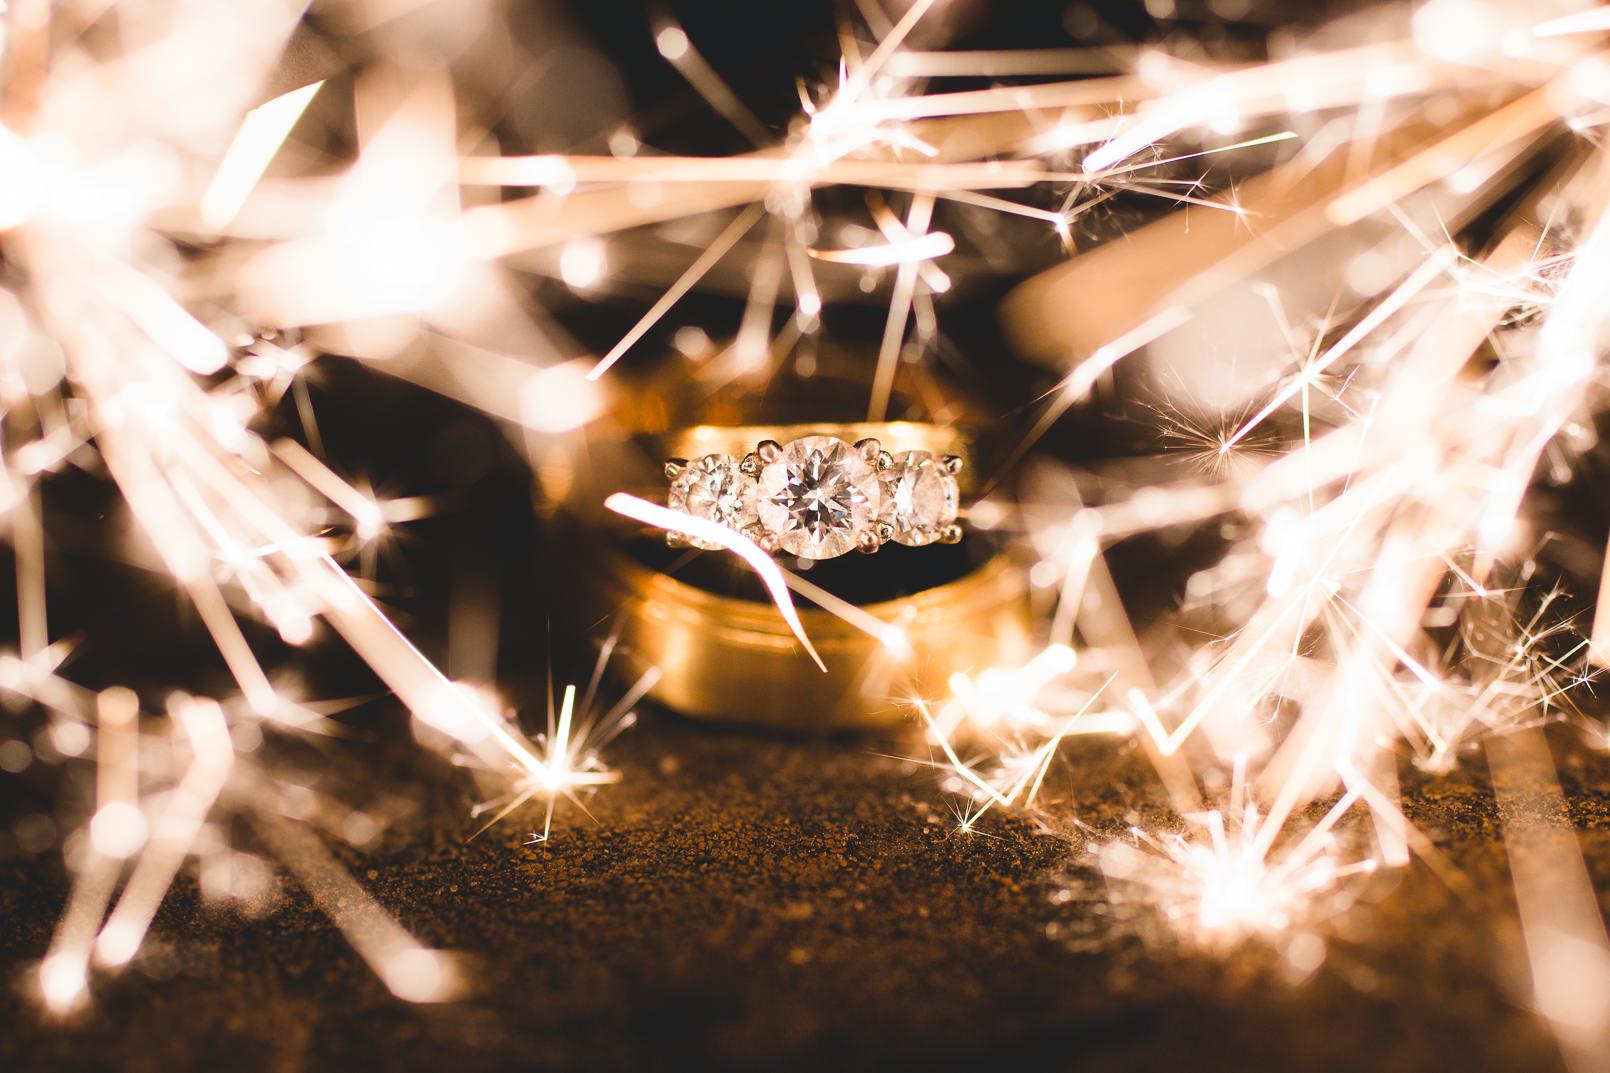 020-Jonathan-Kuhn-Photography-Wedding-_mini.jpg